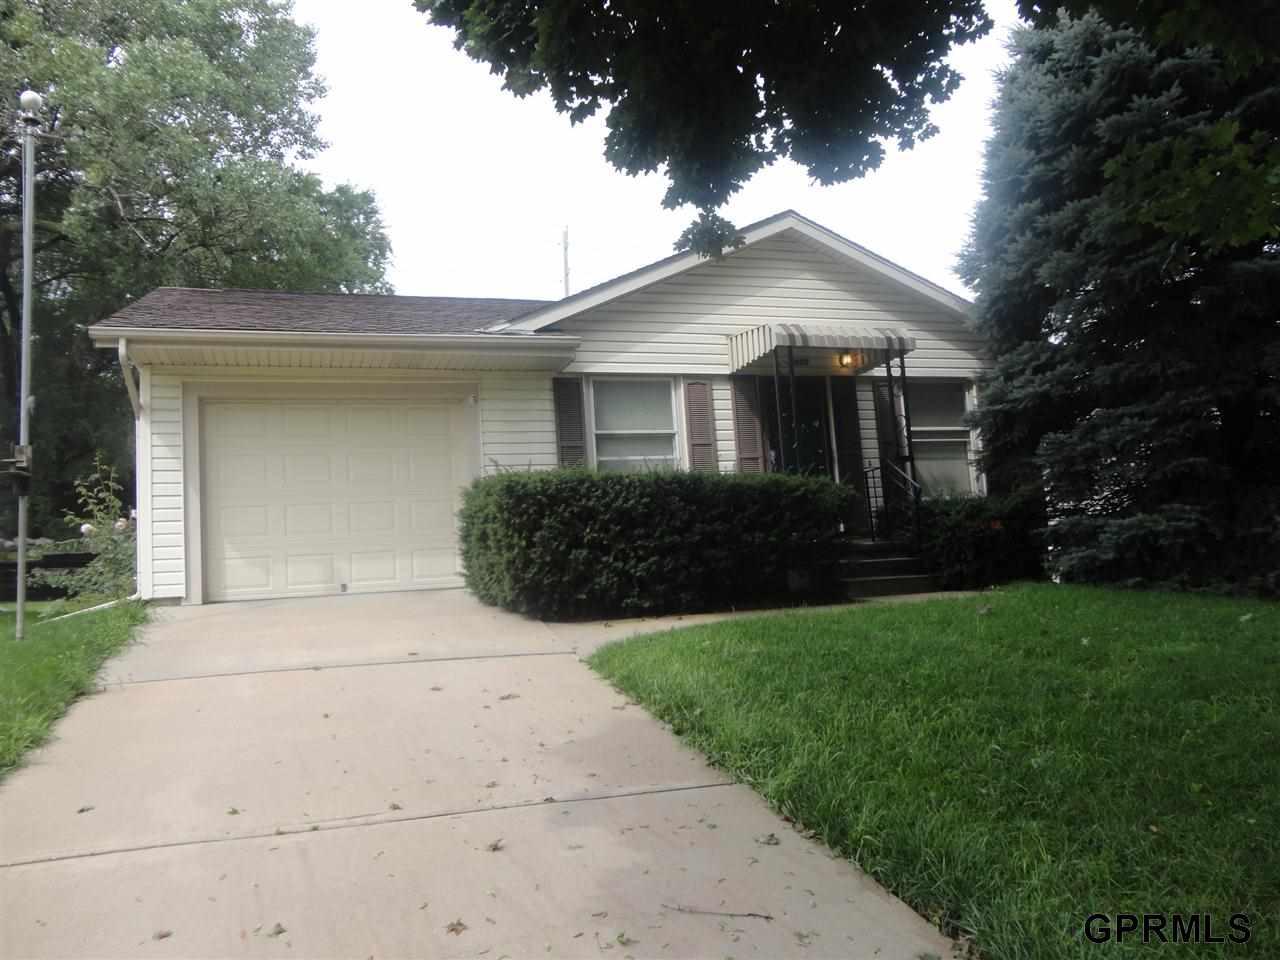 Rental Homes for Rent, ListingId:29708704, location: 2608 S 36 Street Omaha 68105